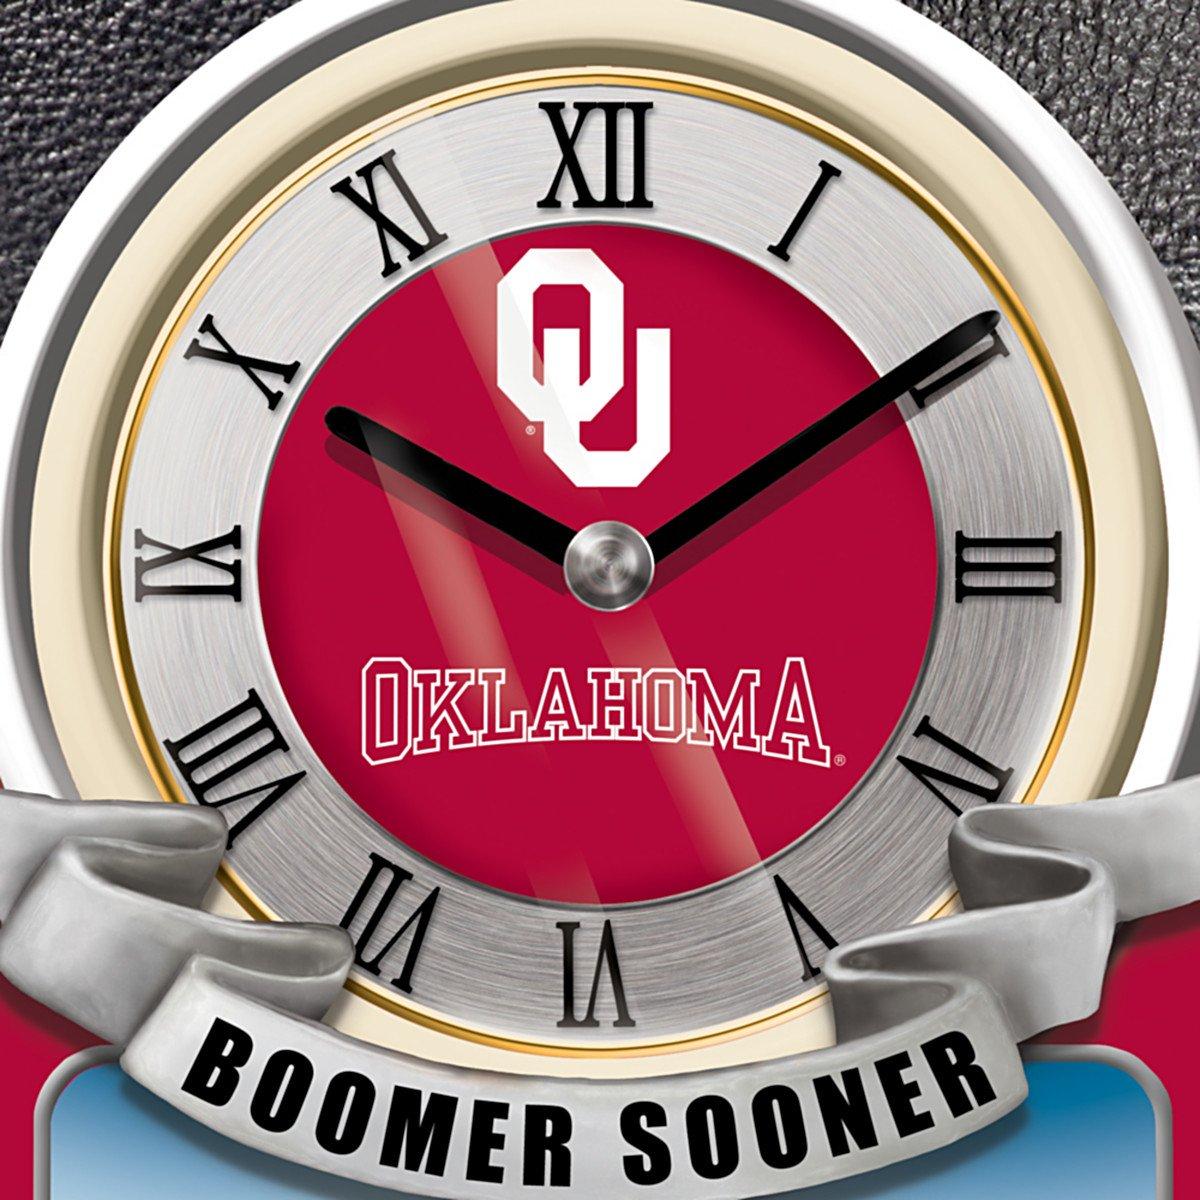 University Of Oklahoma Sooners College Football Cuckoo Clock: Bradford Exchange by The Bradford Exchange by Bradford Exchange (Image #3)